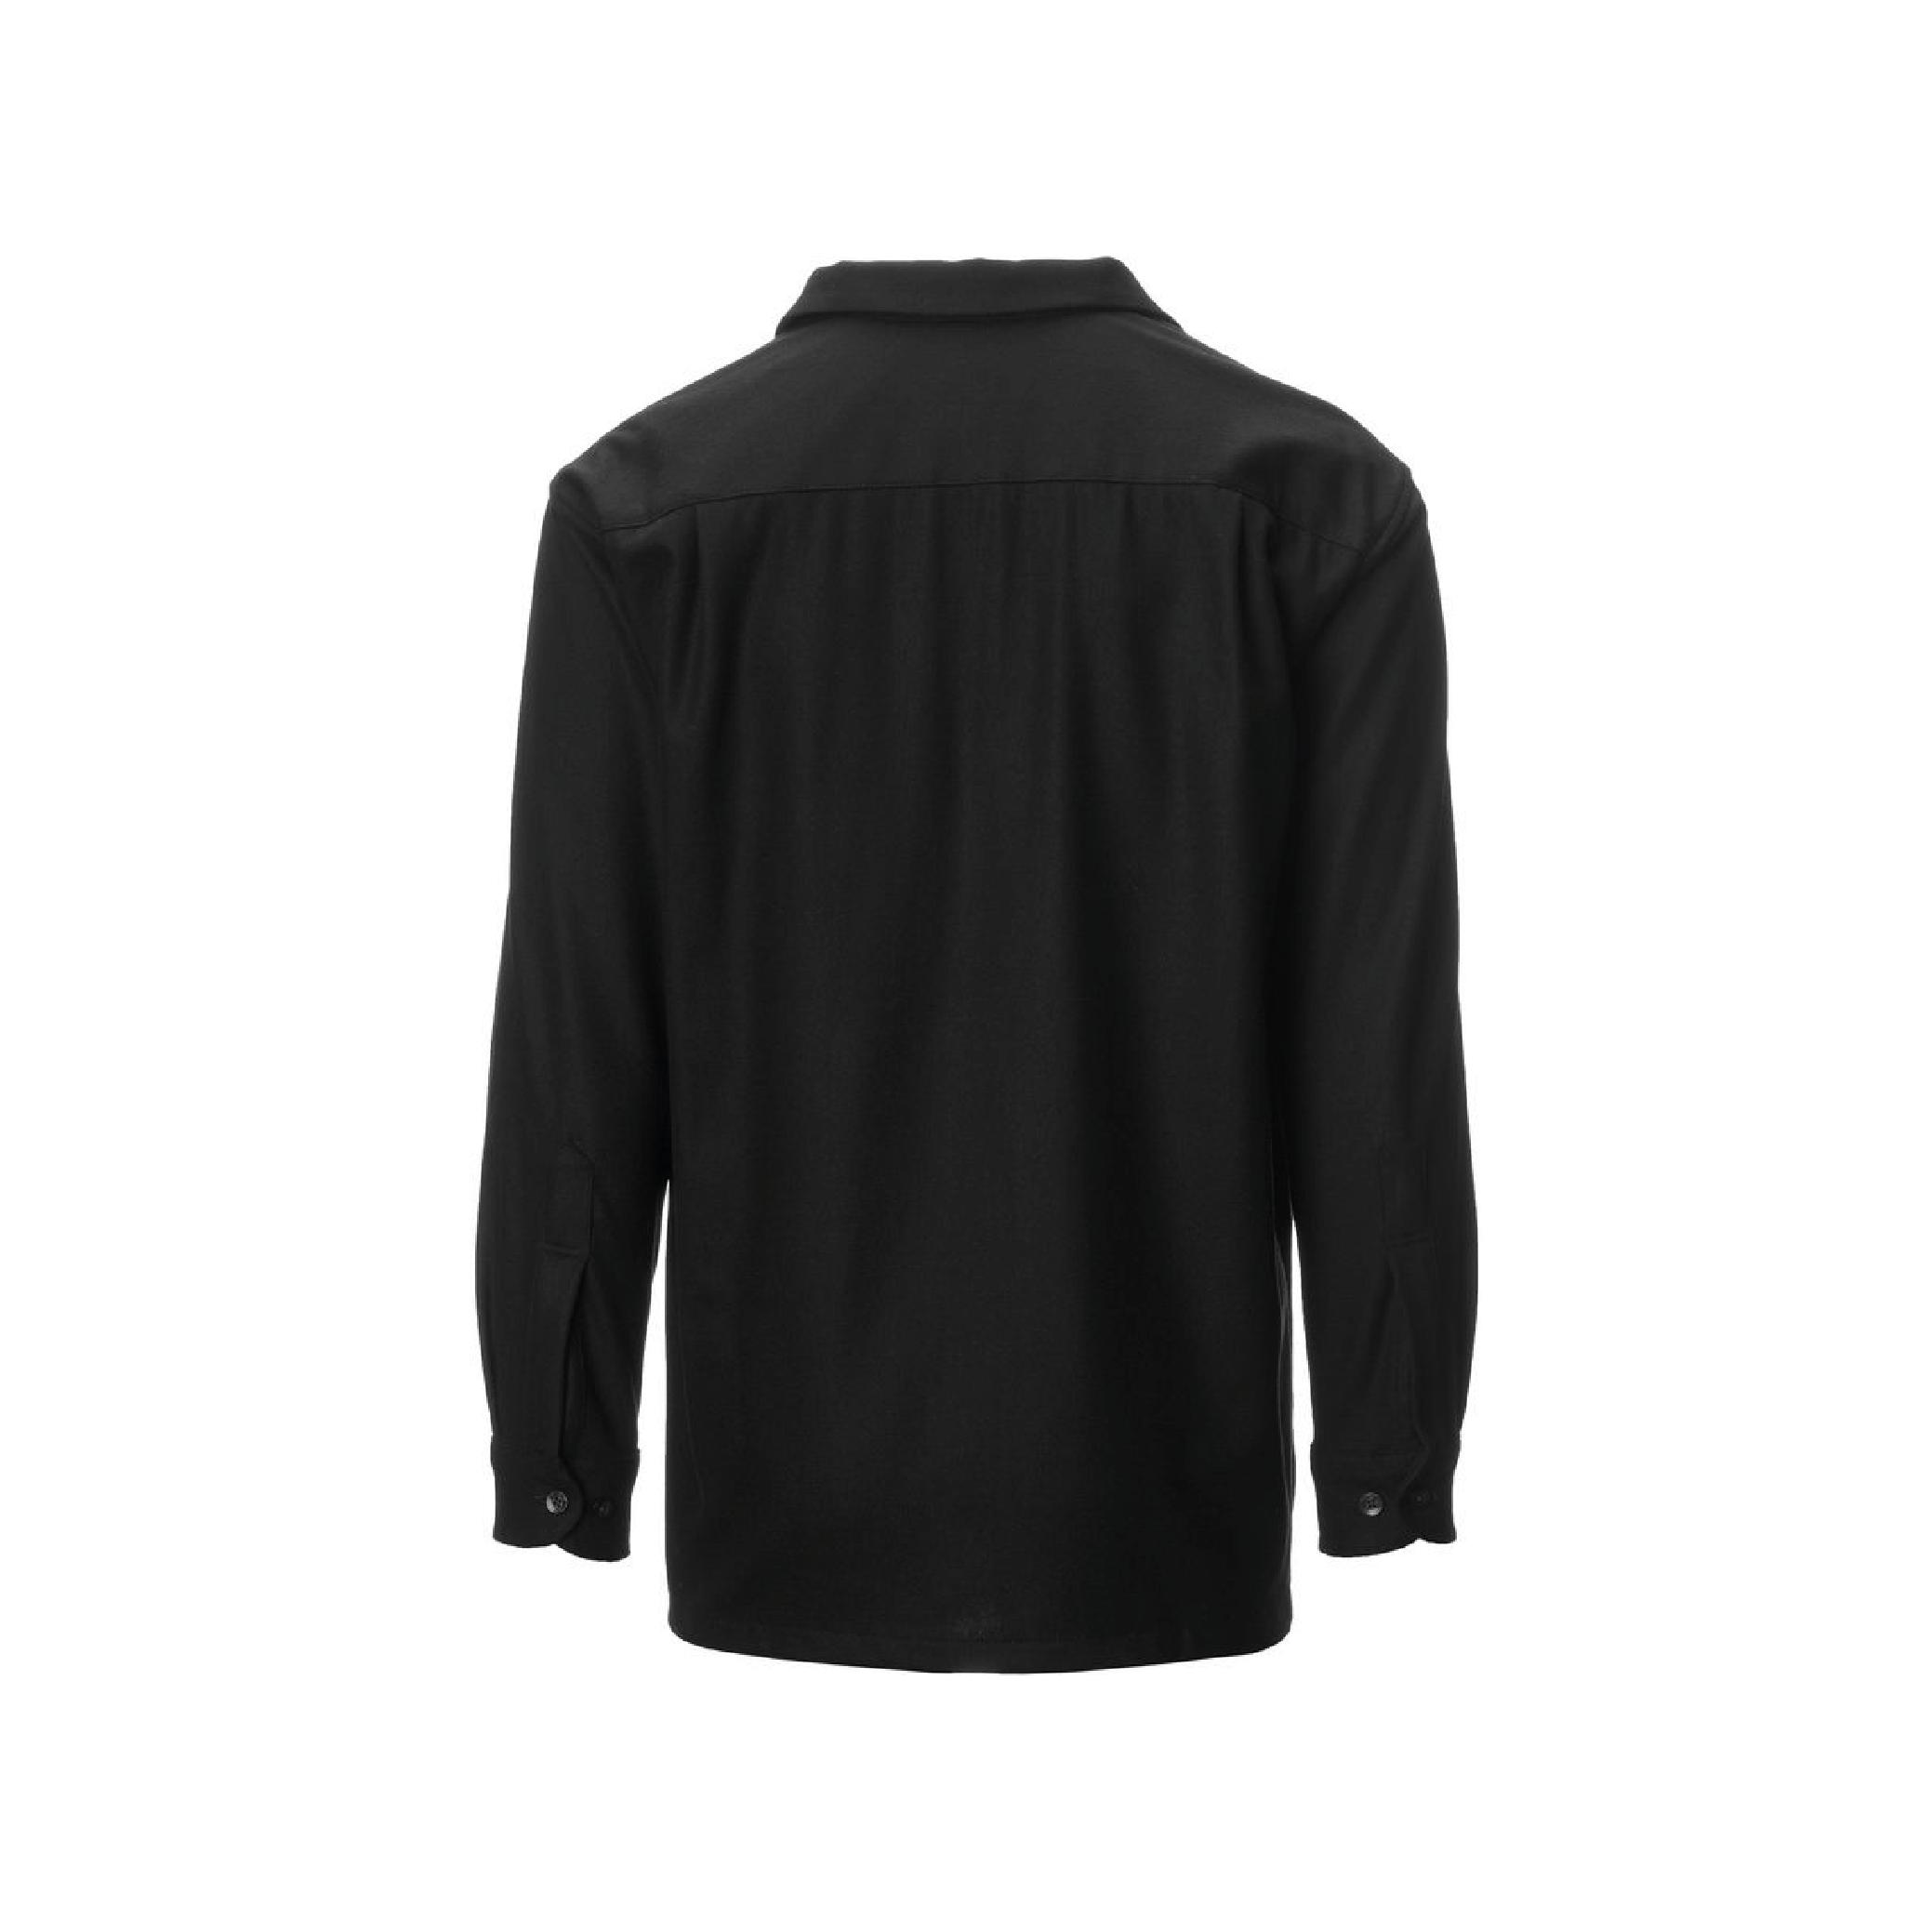 Pendleton Board shirt black back.png